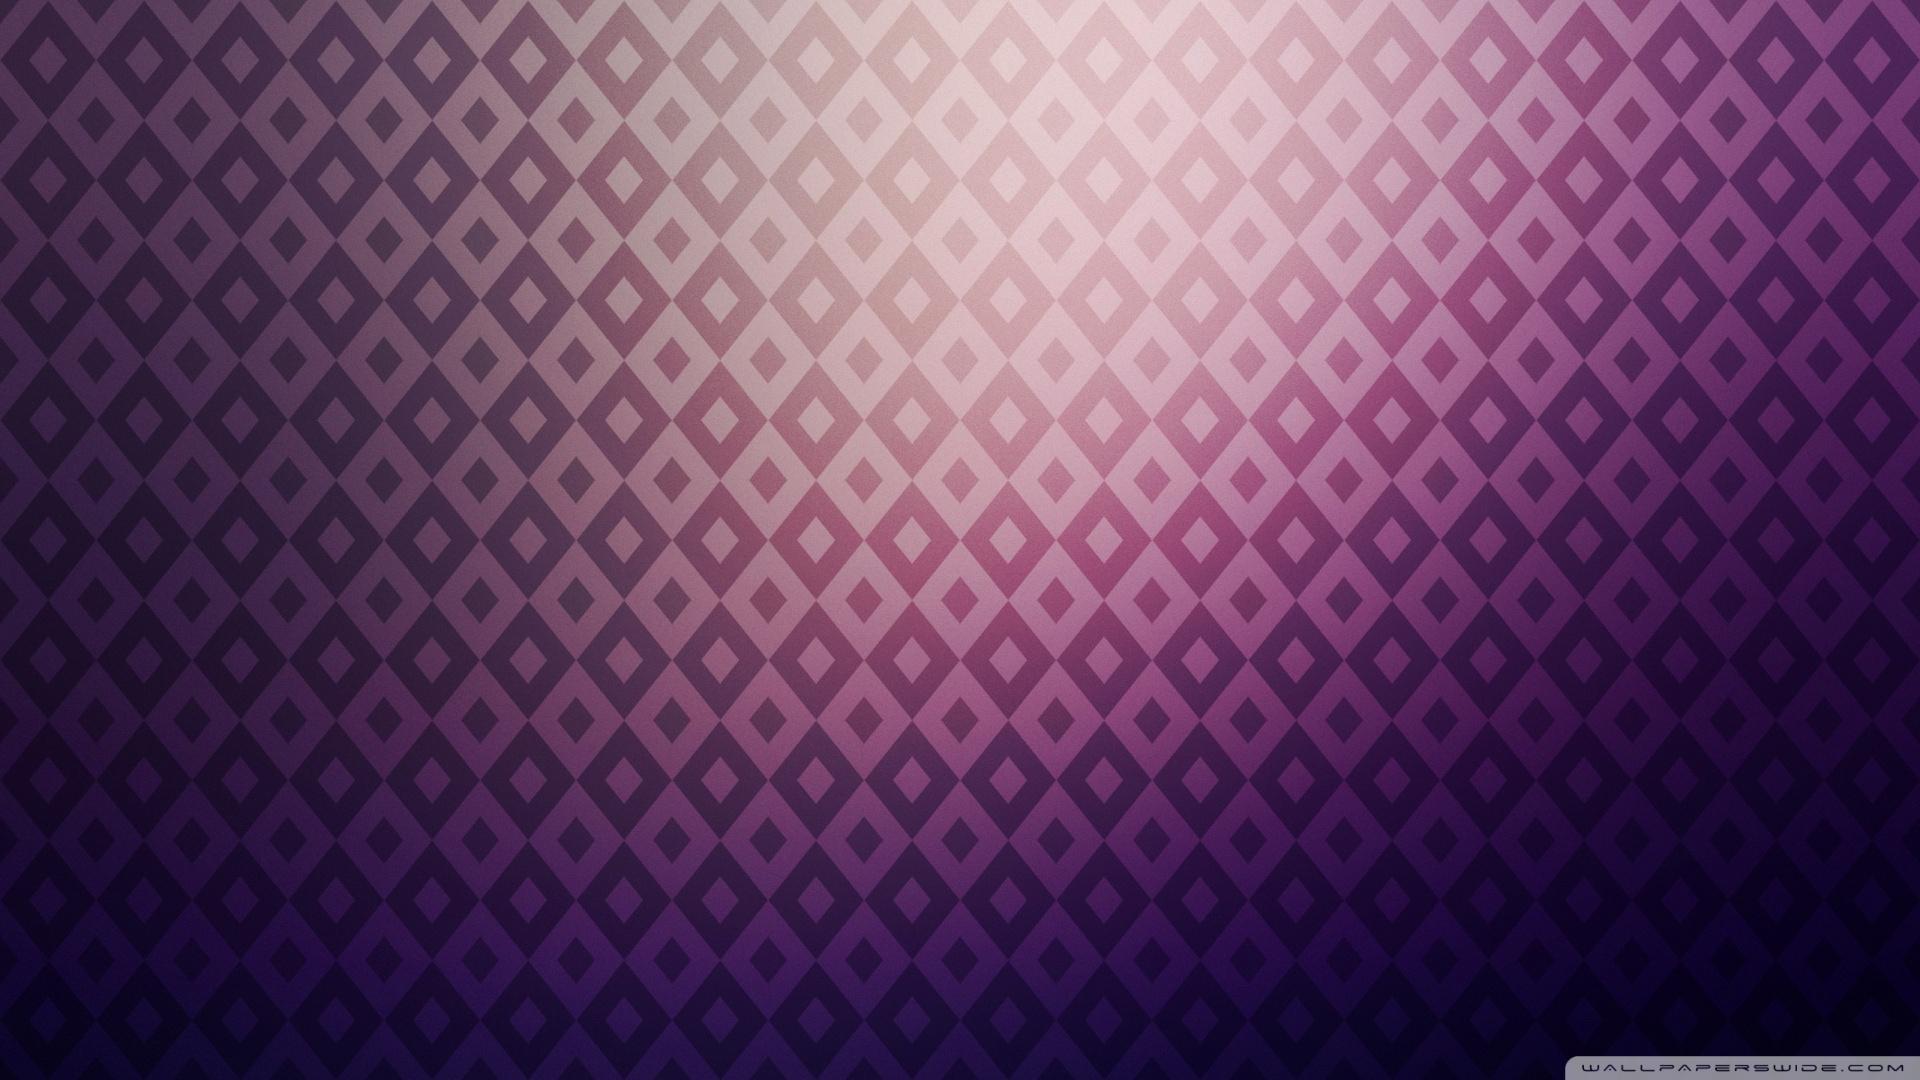 purple diamond texture HD Wallpaper